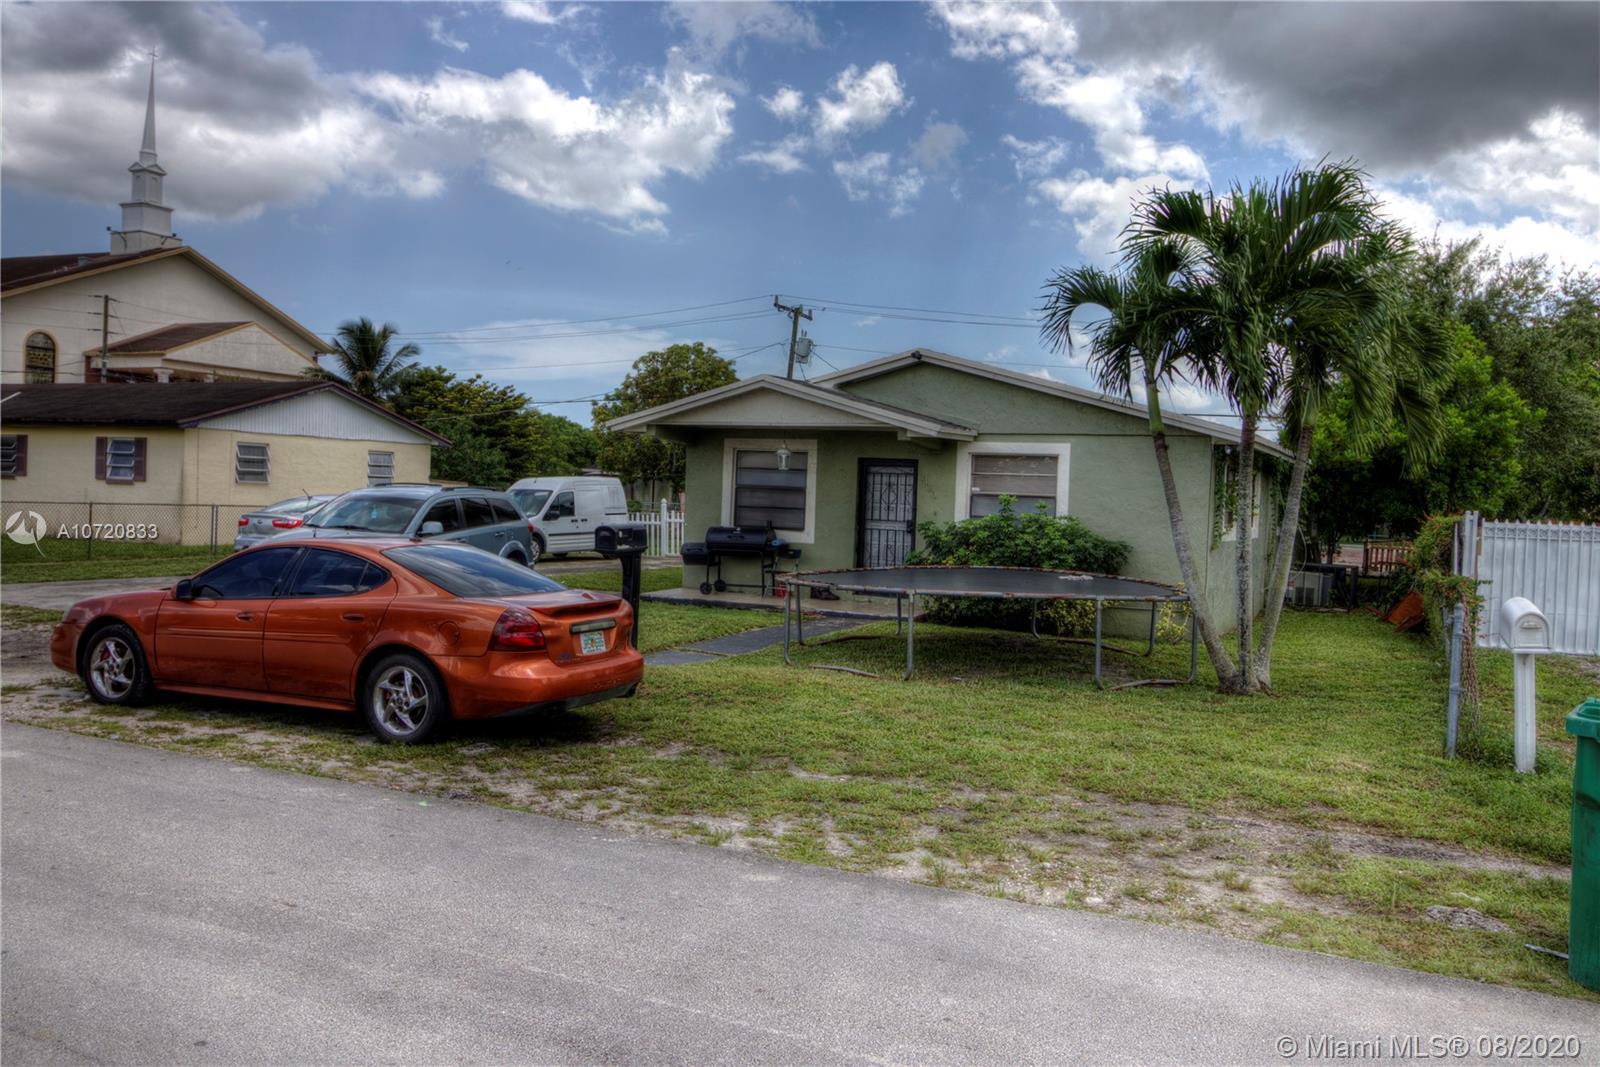 3420 NW 213th Ter, Miami Gardens, FL 33056